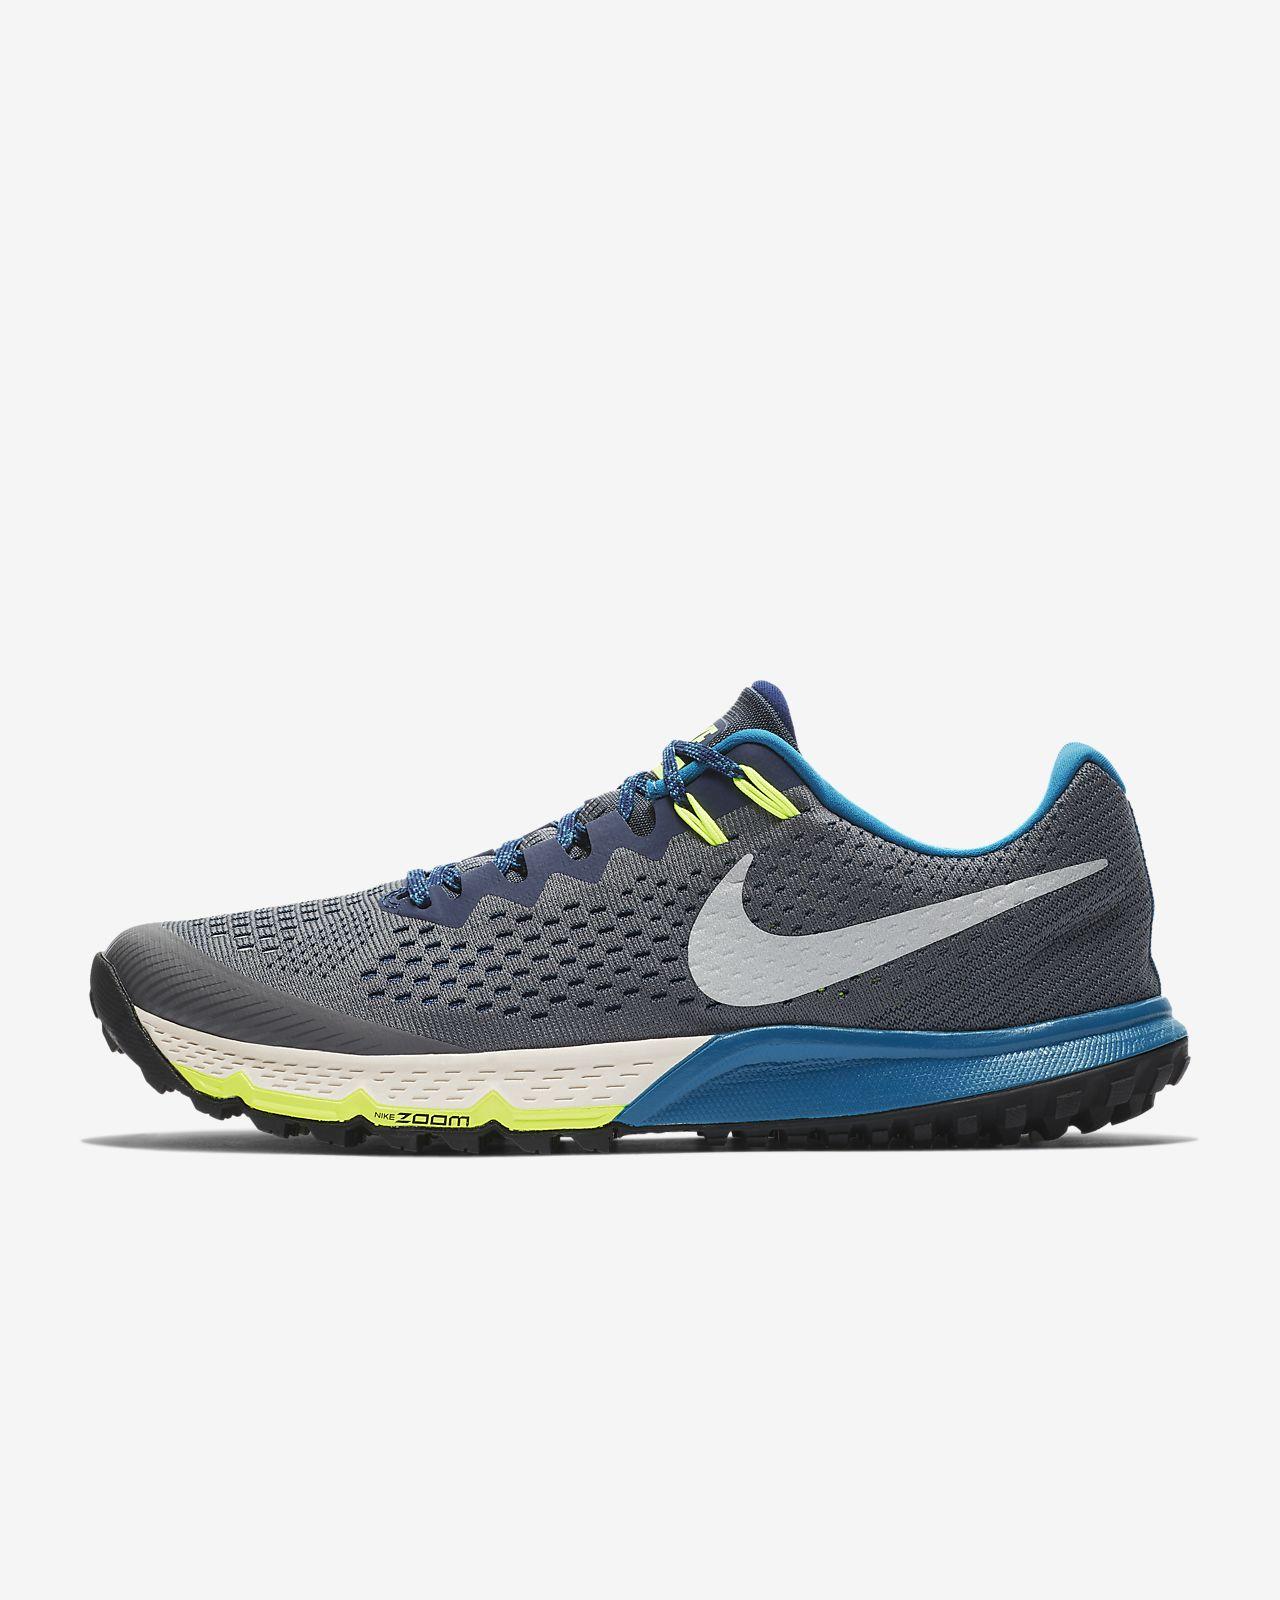 36d7c58a2 Sapatilhas de running Nike Air Zoom Terra Kiger 4 para homem. Nike ...